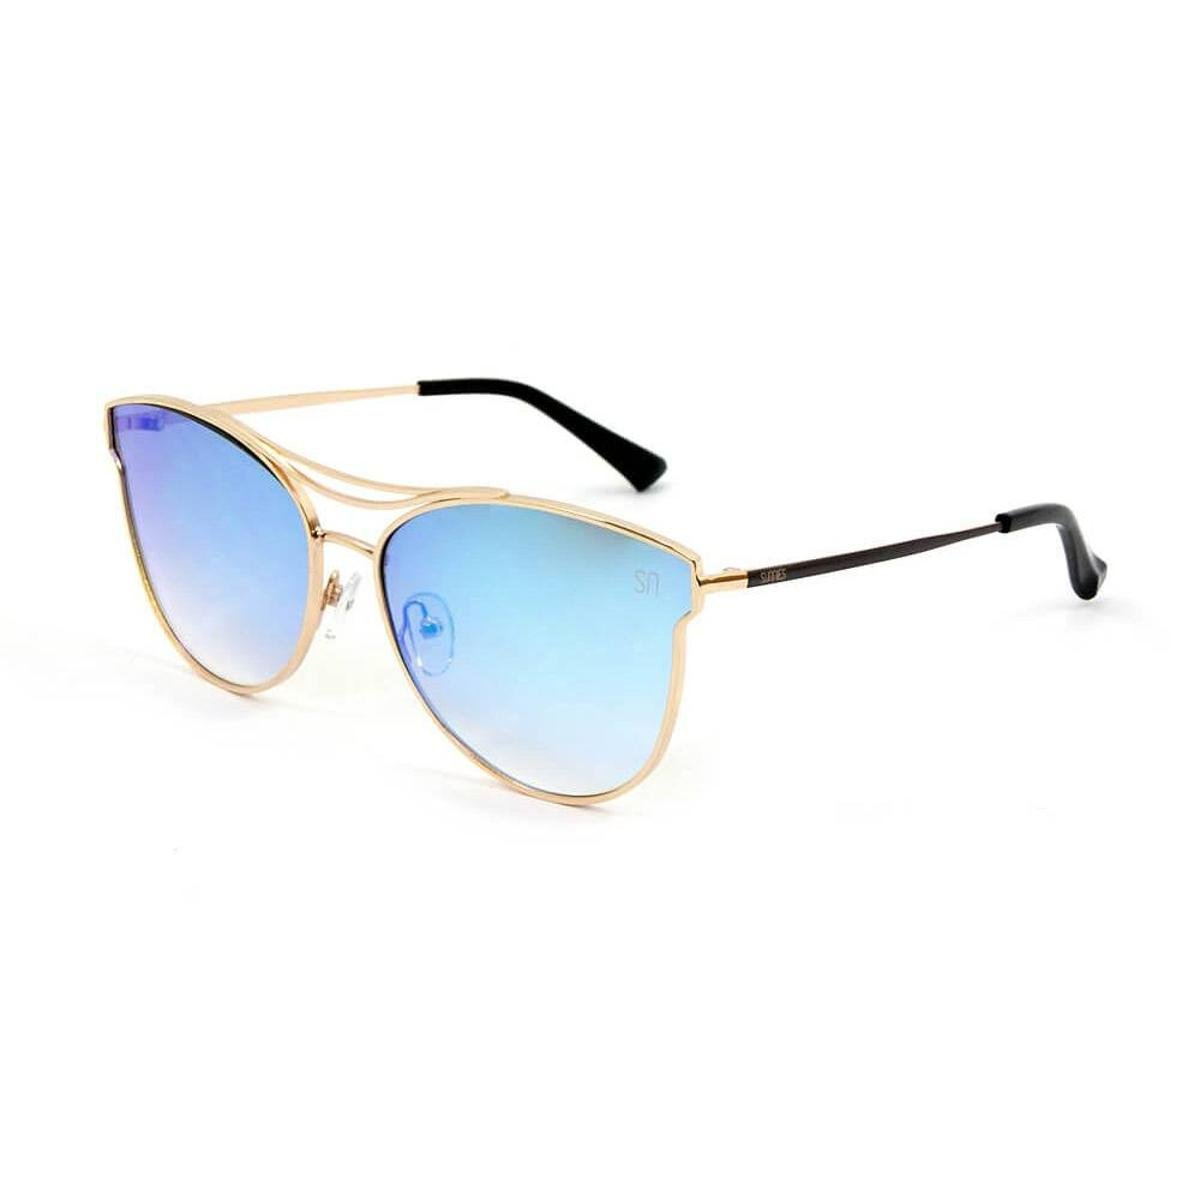 Óculos de Sol Espelhado - Azul e Dourado - Compre Agora   Zattini a521dd0bf7